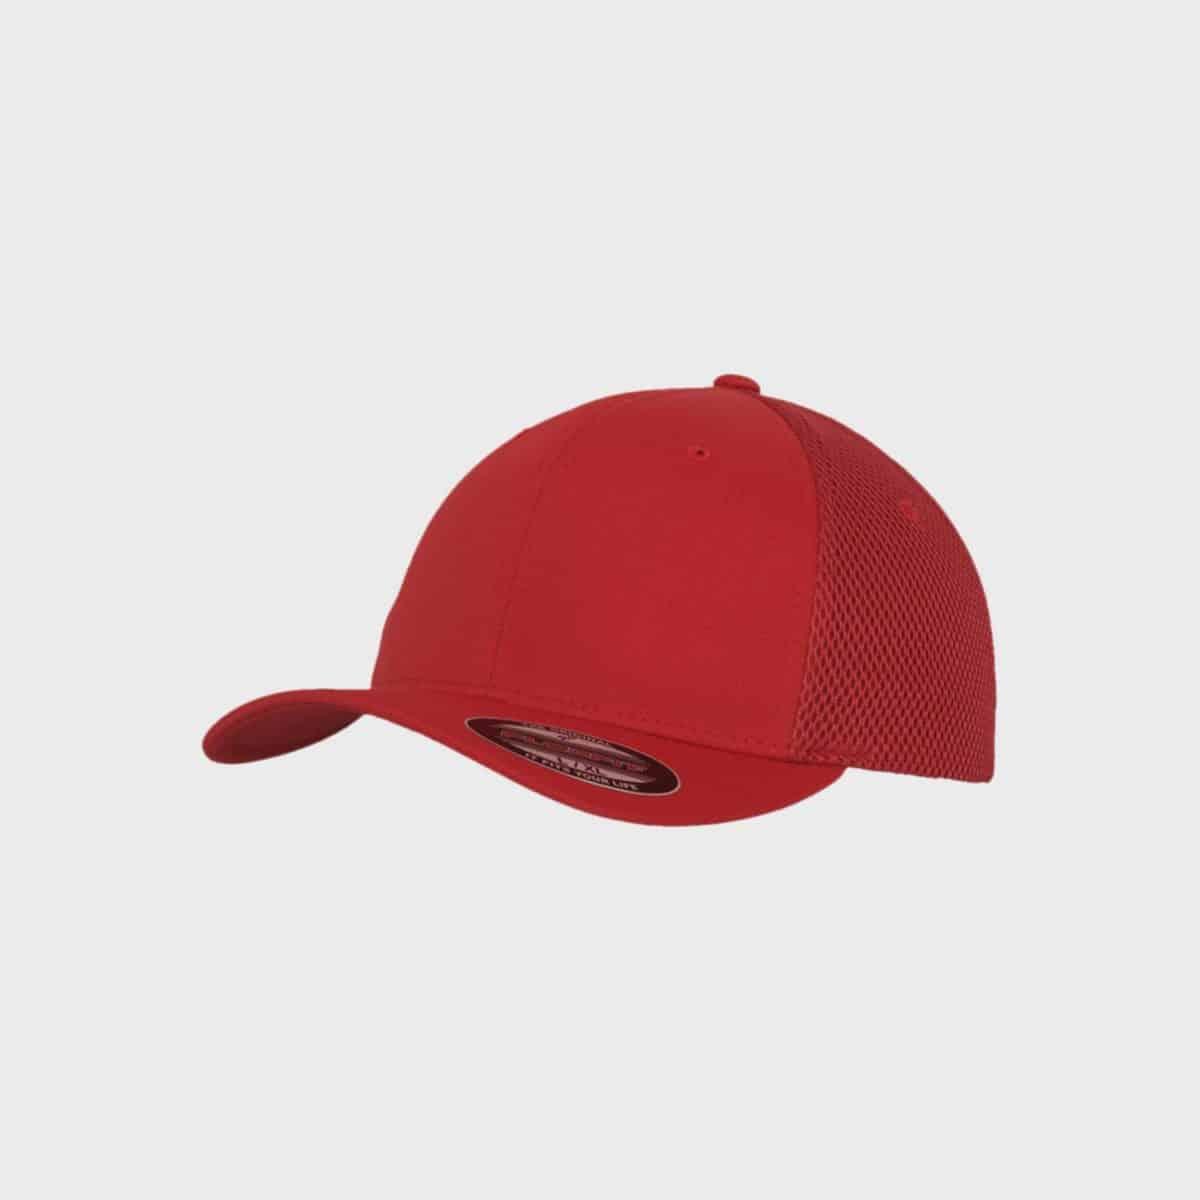 Flexfit FlexfitCaps FFE 6533 Red Front Side